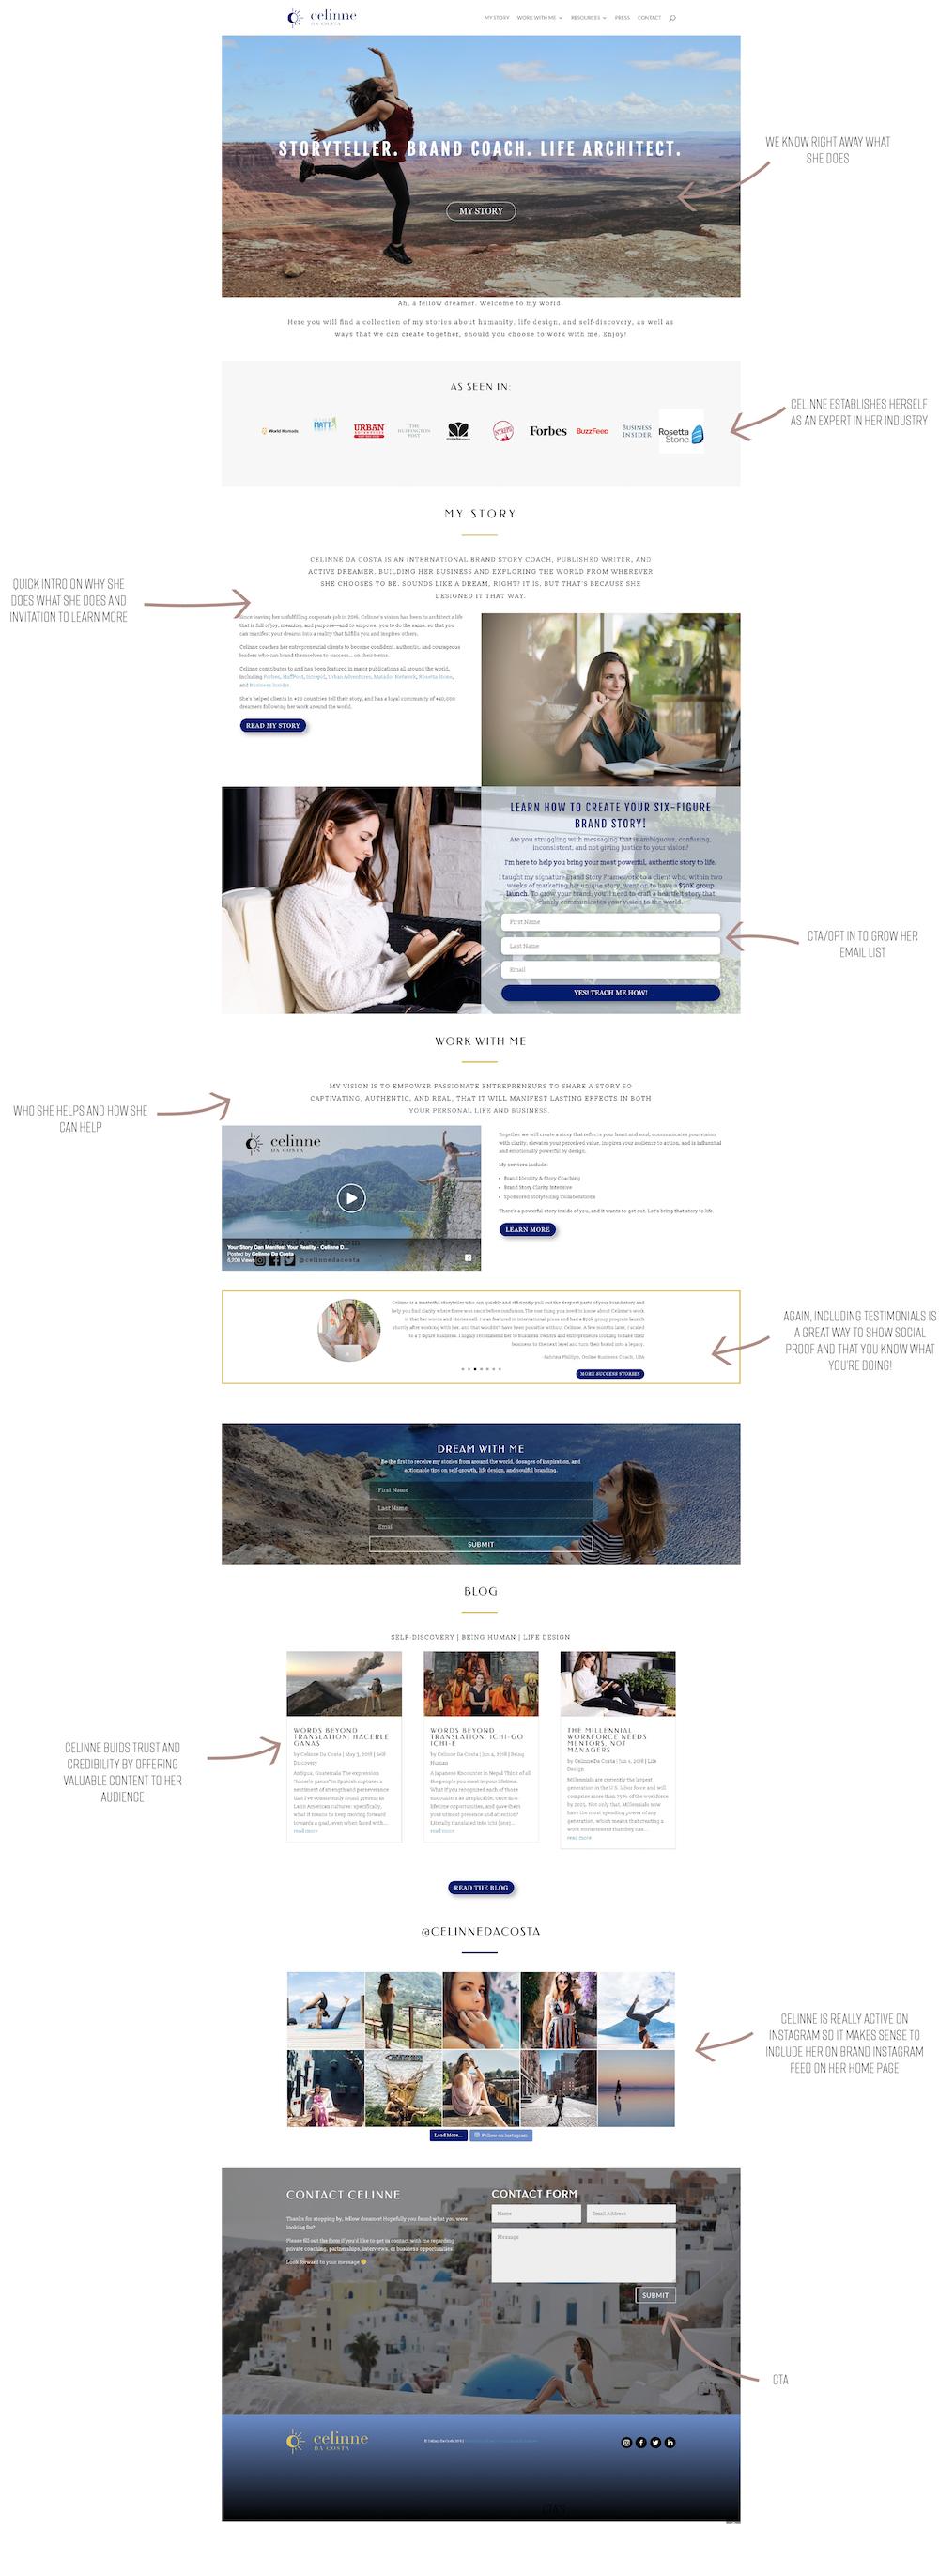 Celinne Da Acosta's Homepage